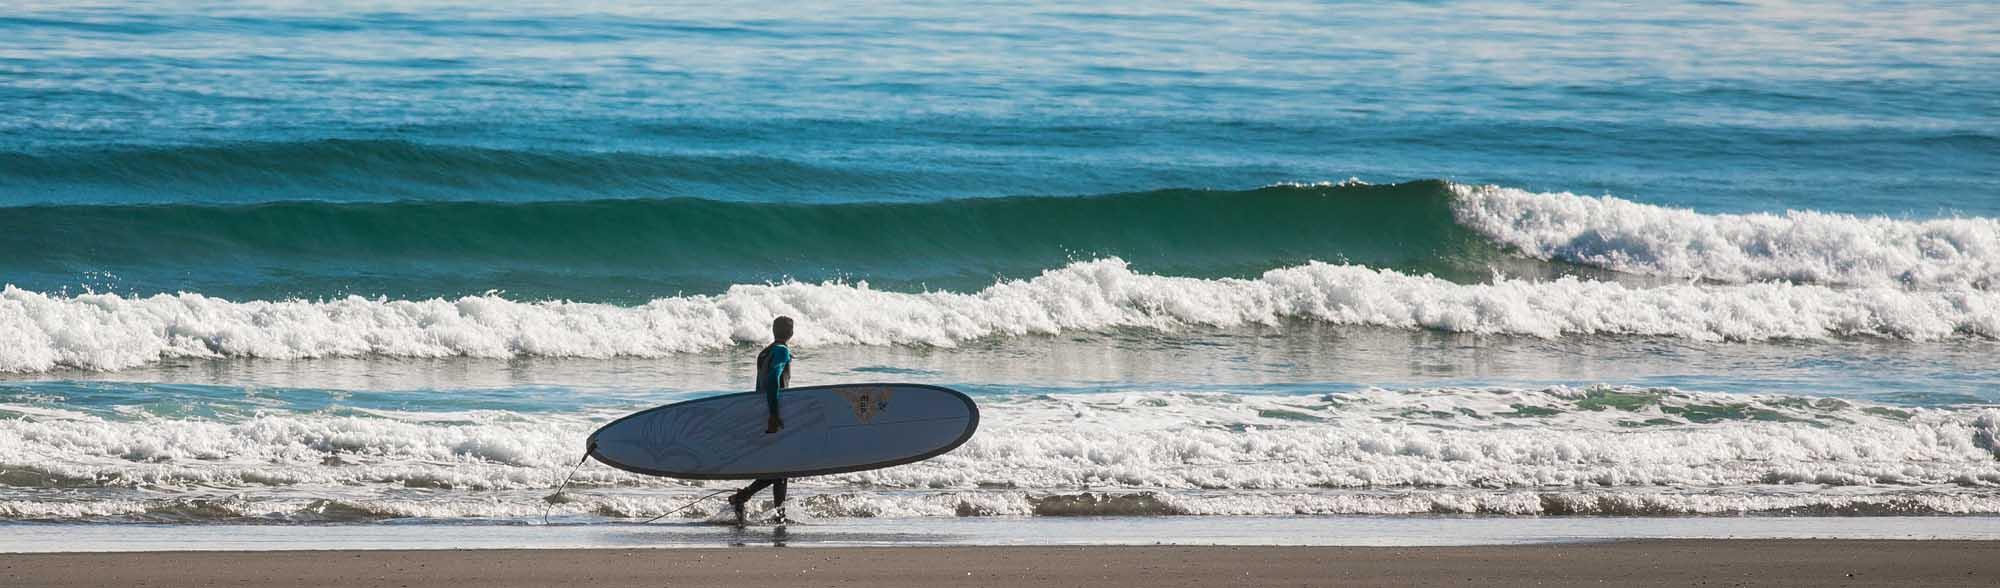 Matarangi Surfer 1030mm by 303mm 300dpi.jpg